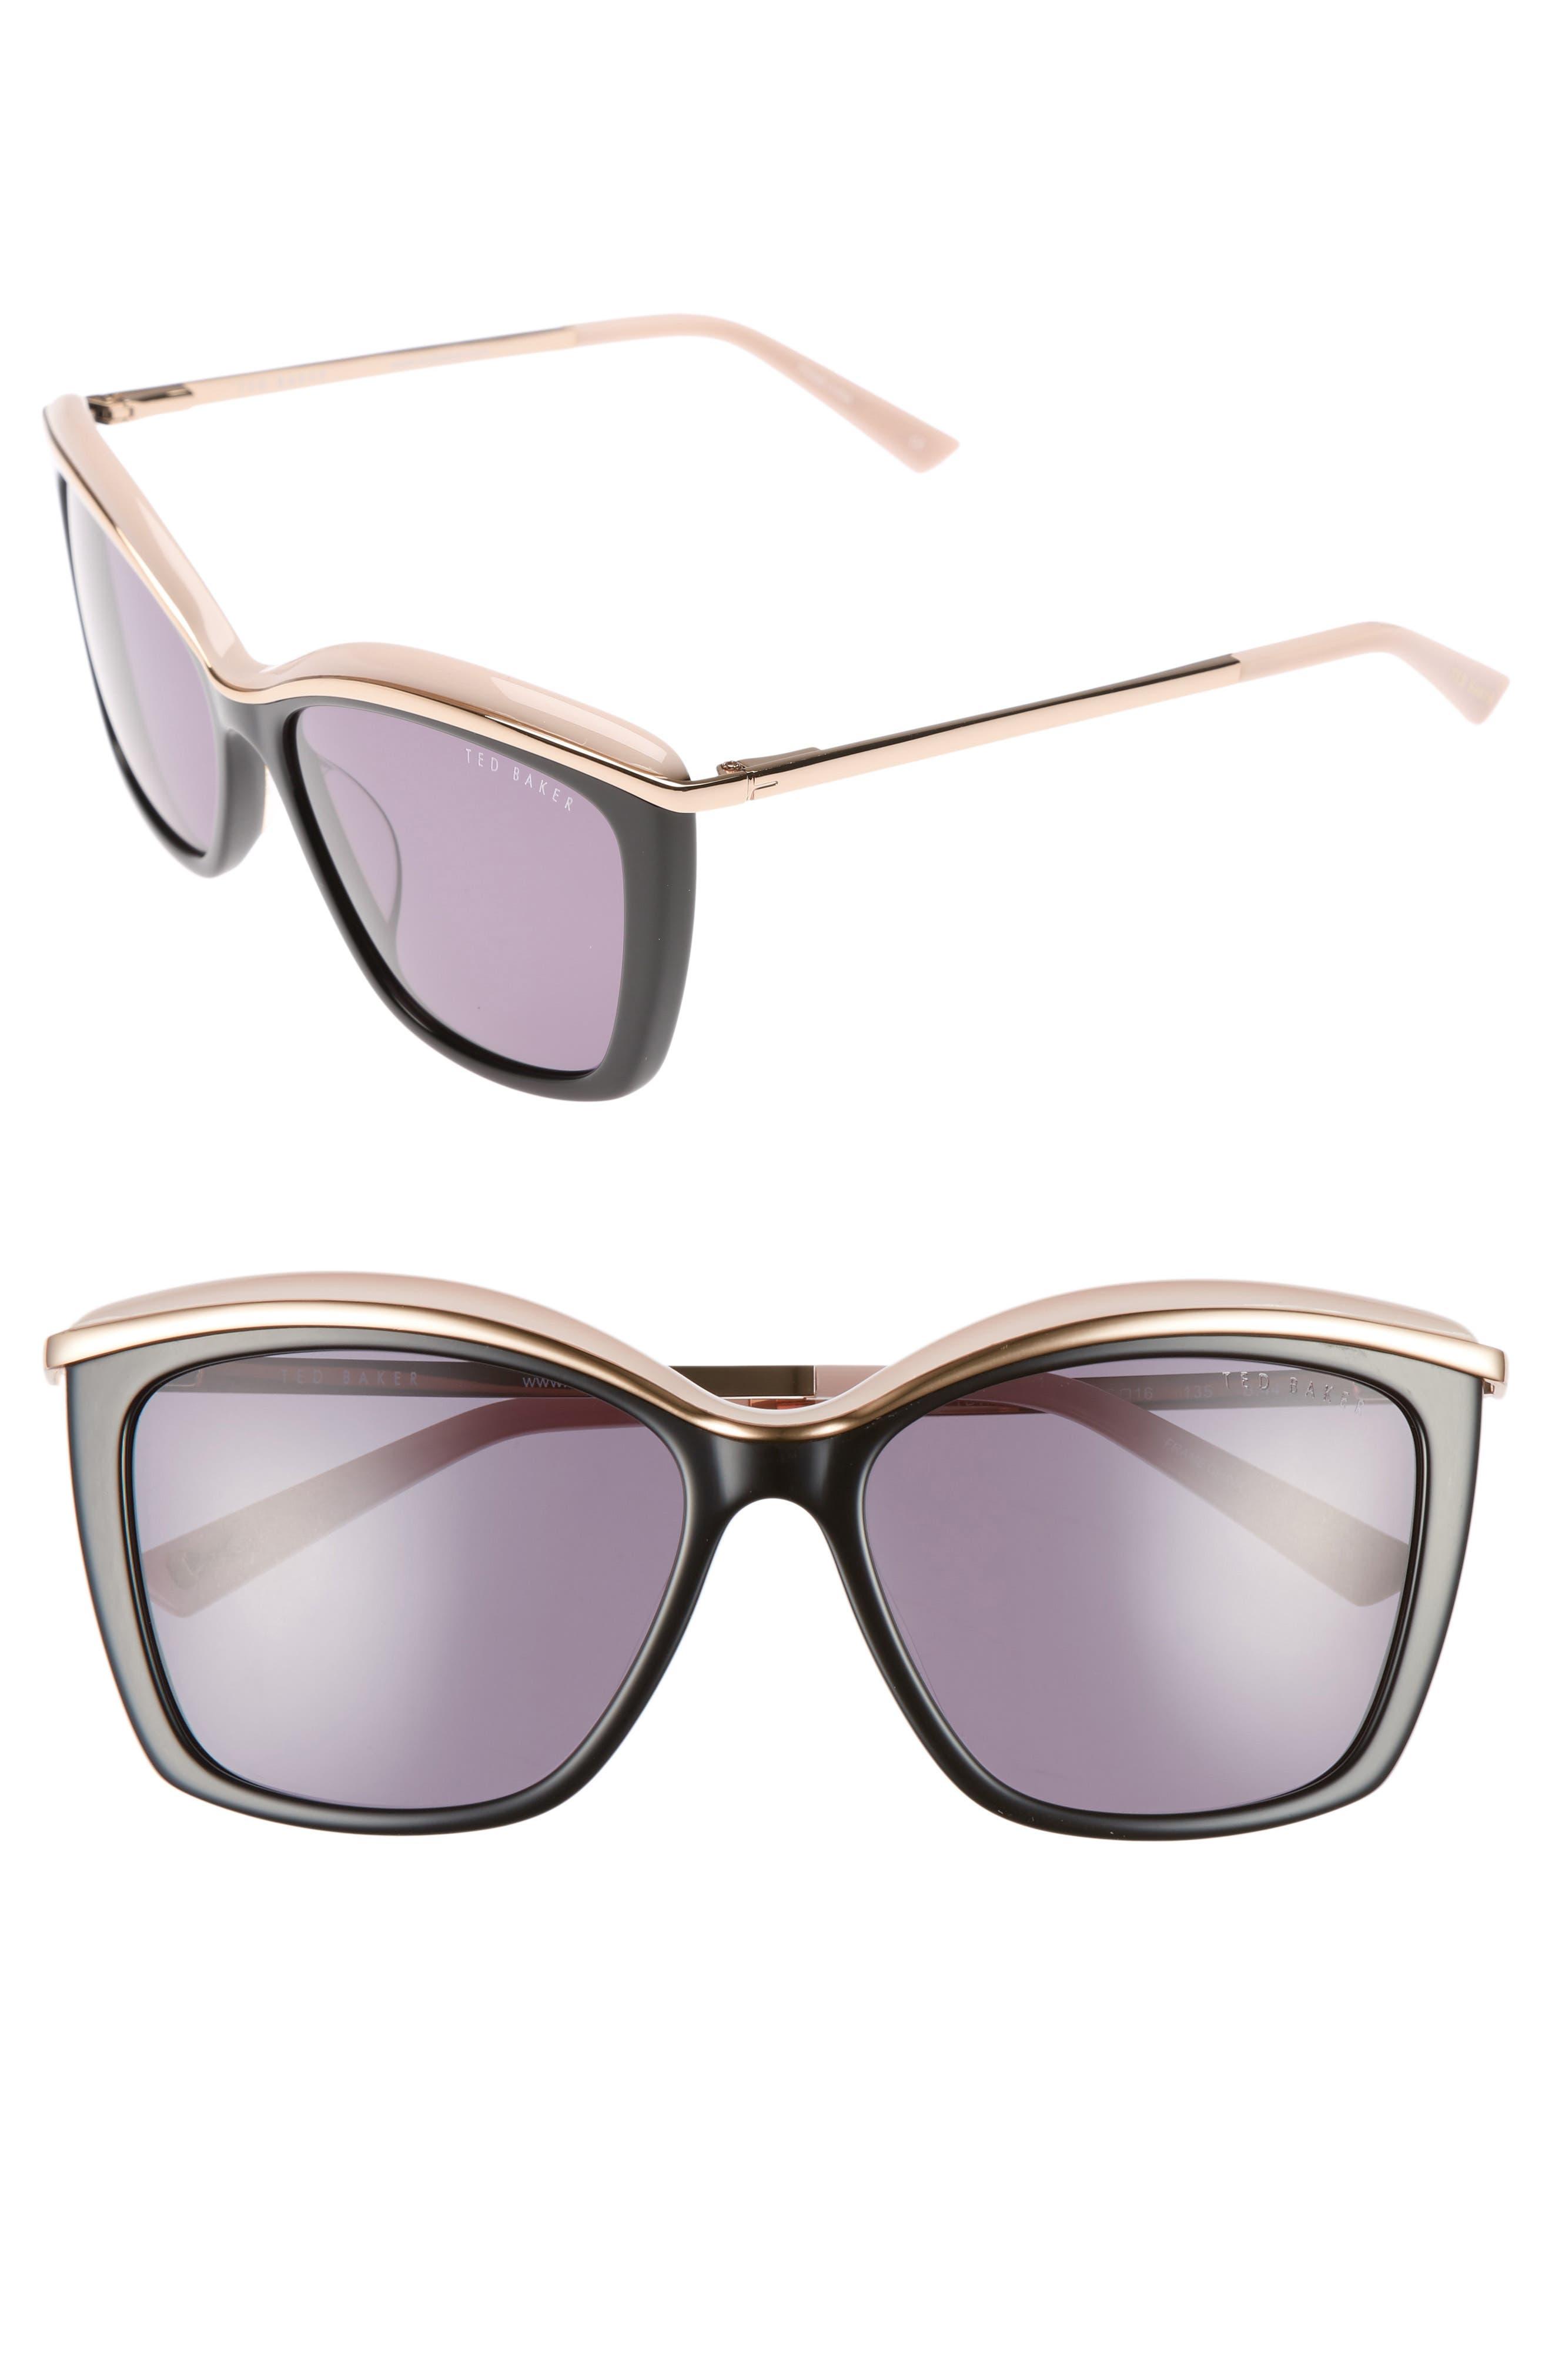 55mm Cat Eye Sunglasses,                         Main,                         color, 001